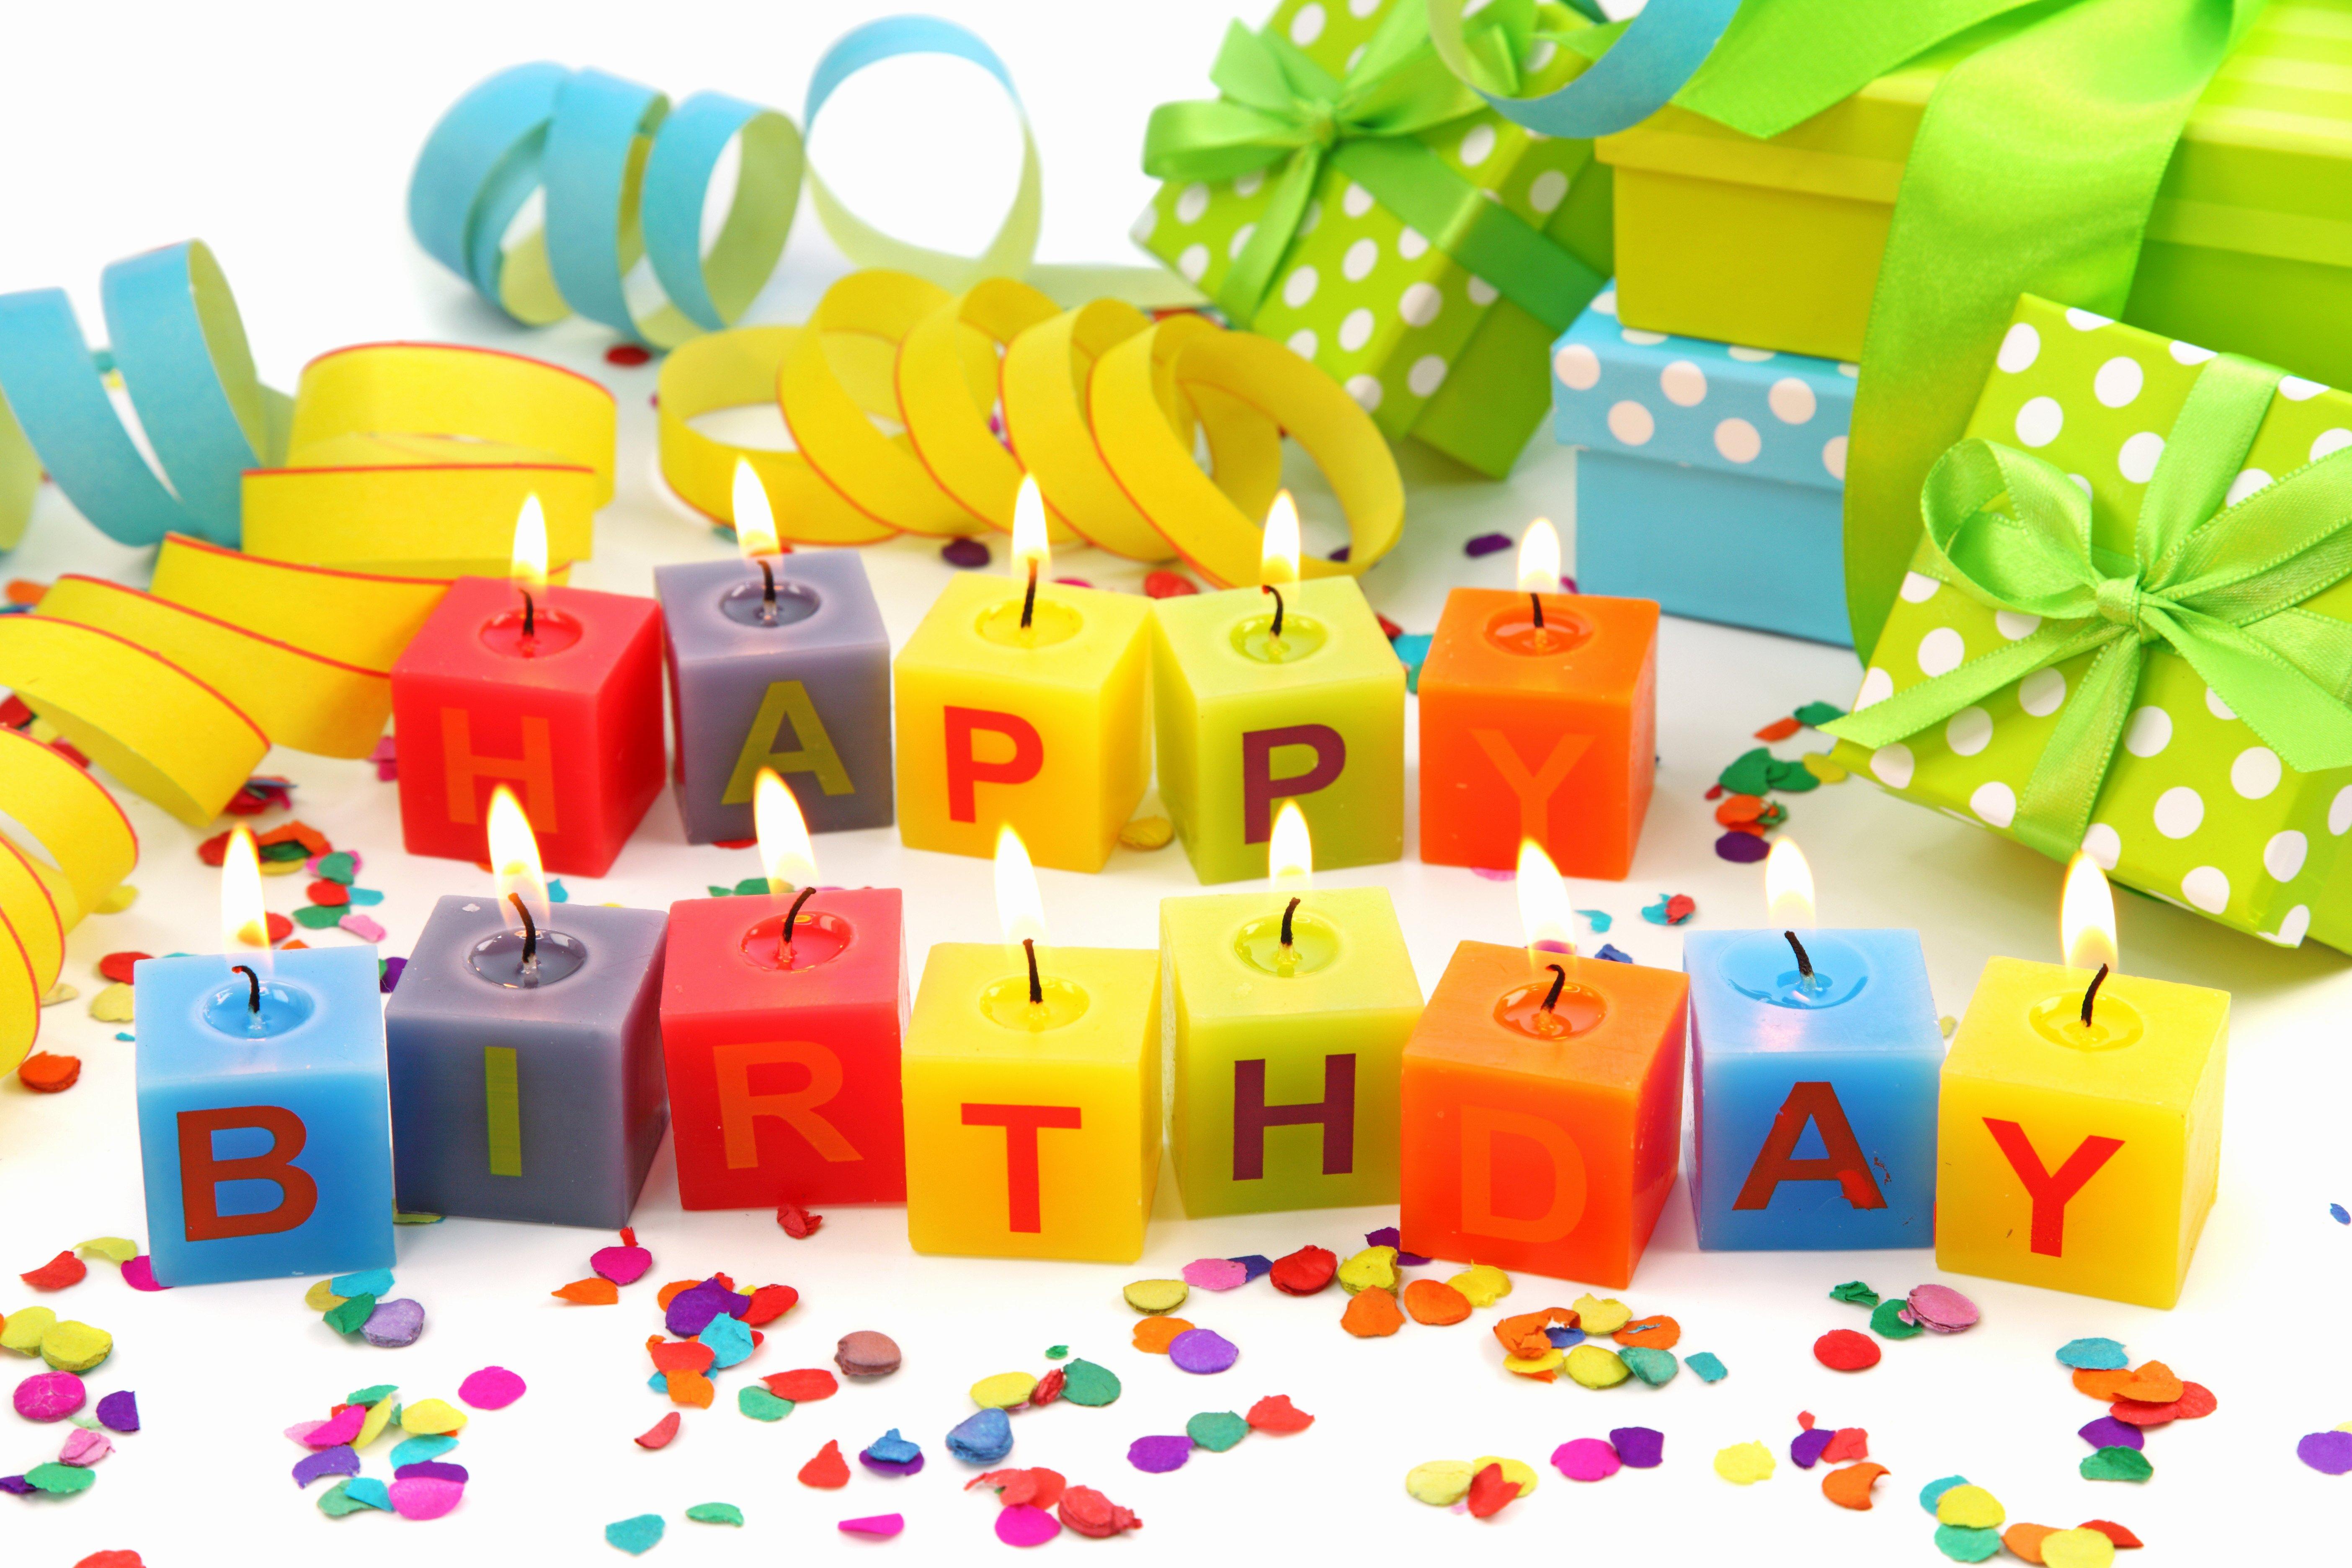 Happy Bday Wallpapers Free Unique Happy Birthday